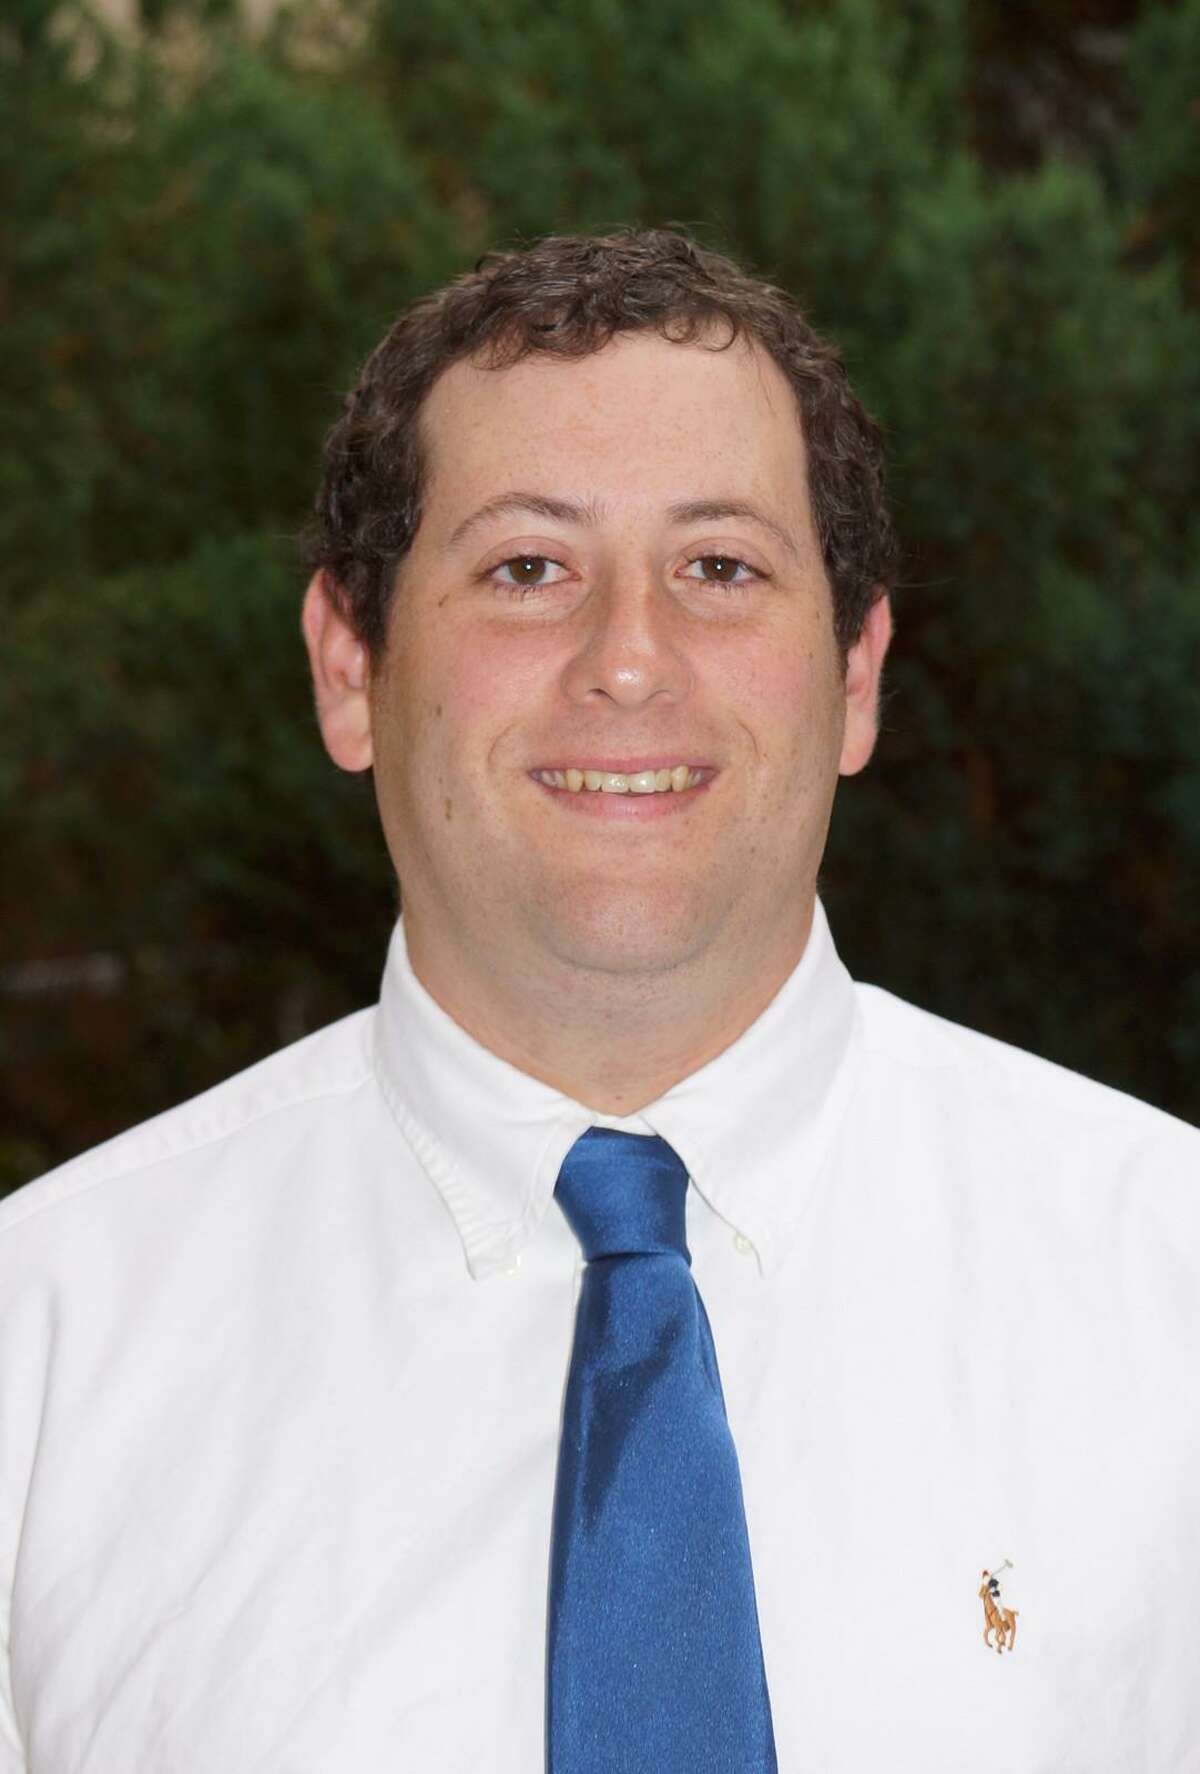 Southern Connecticut State interim athletic director Matt Letkowski